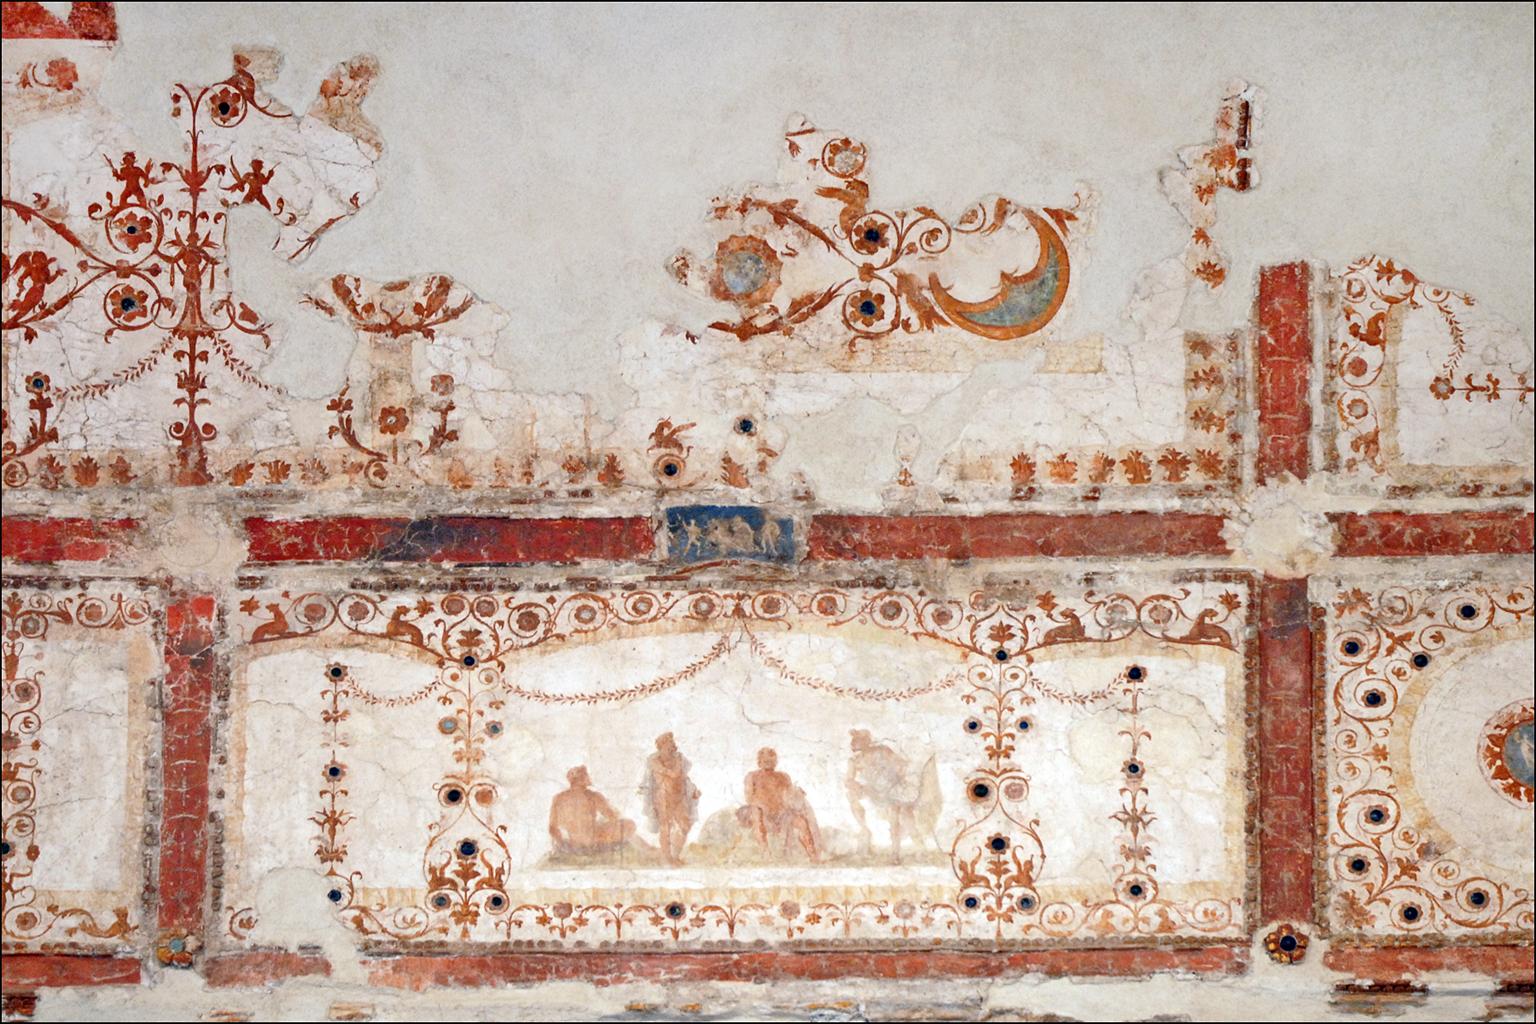 file peintures murales de la domus transitoria rome 5979997231 jpg wikimedia commons. Black Bedroom Furniture Sets. Home Design Ideas